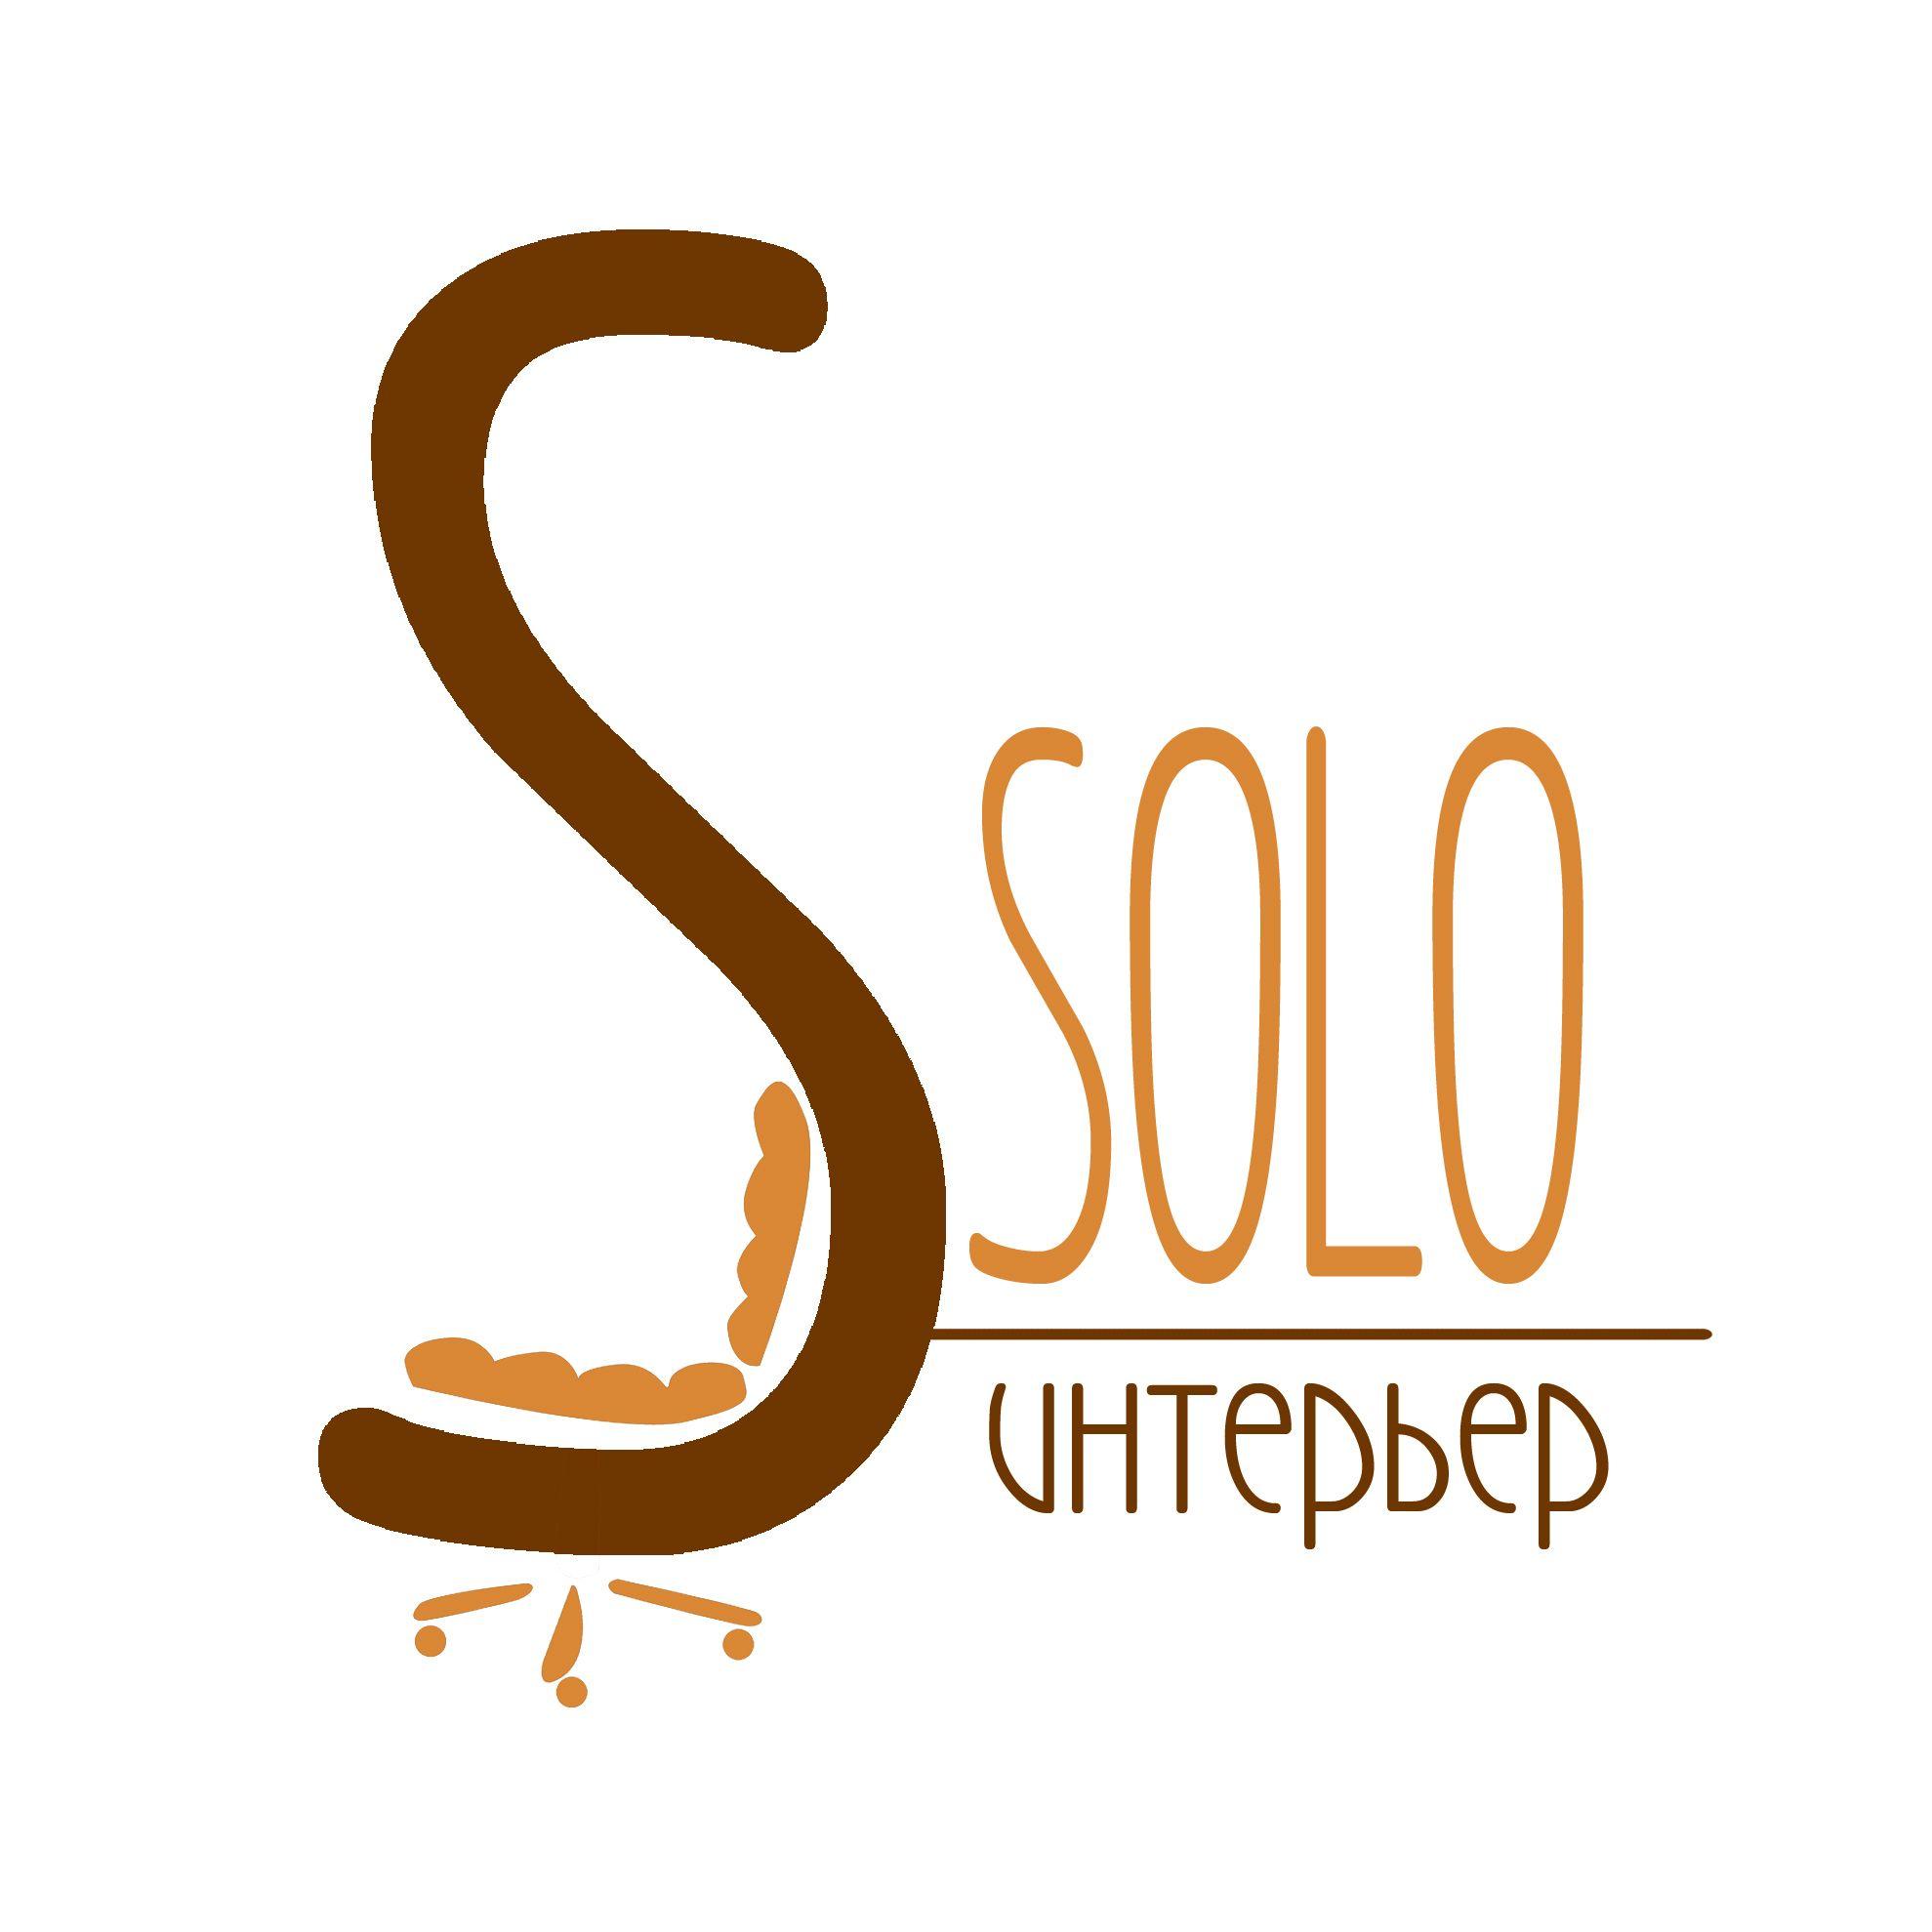 Редизайн логотипа - дизайнер aplatosha